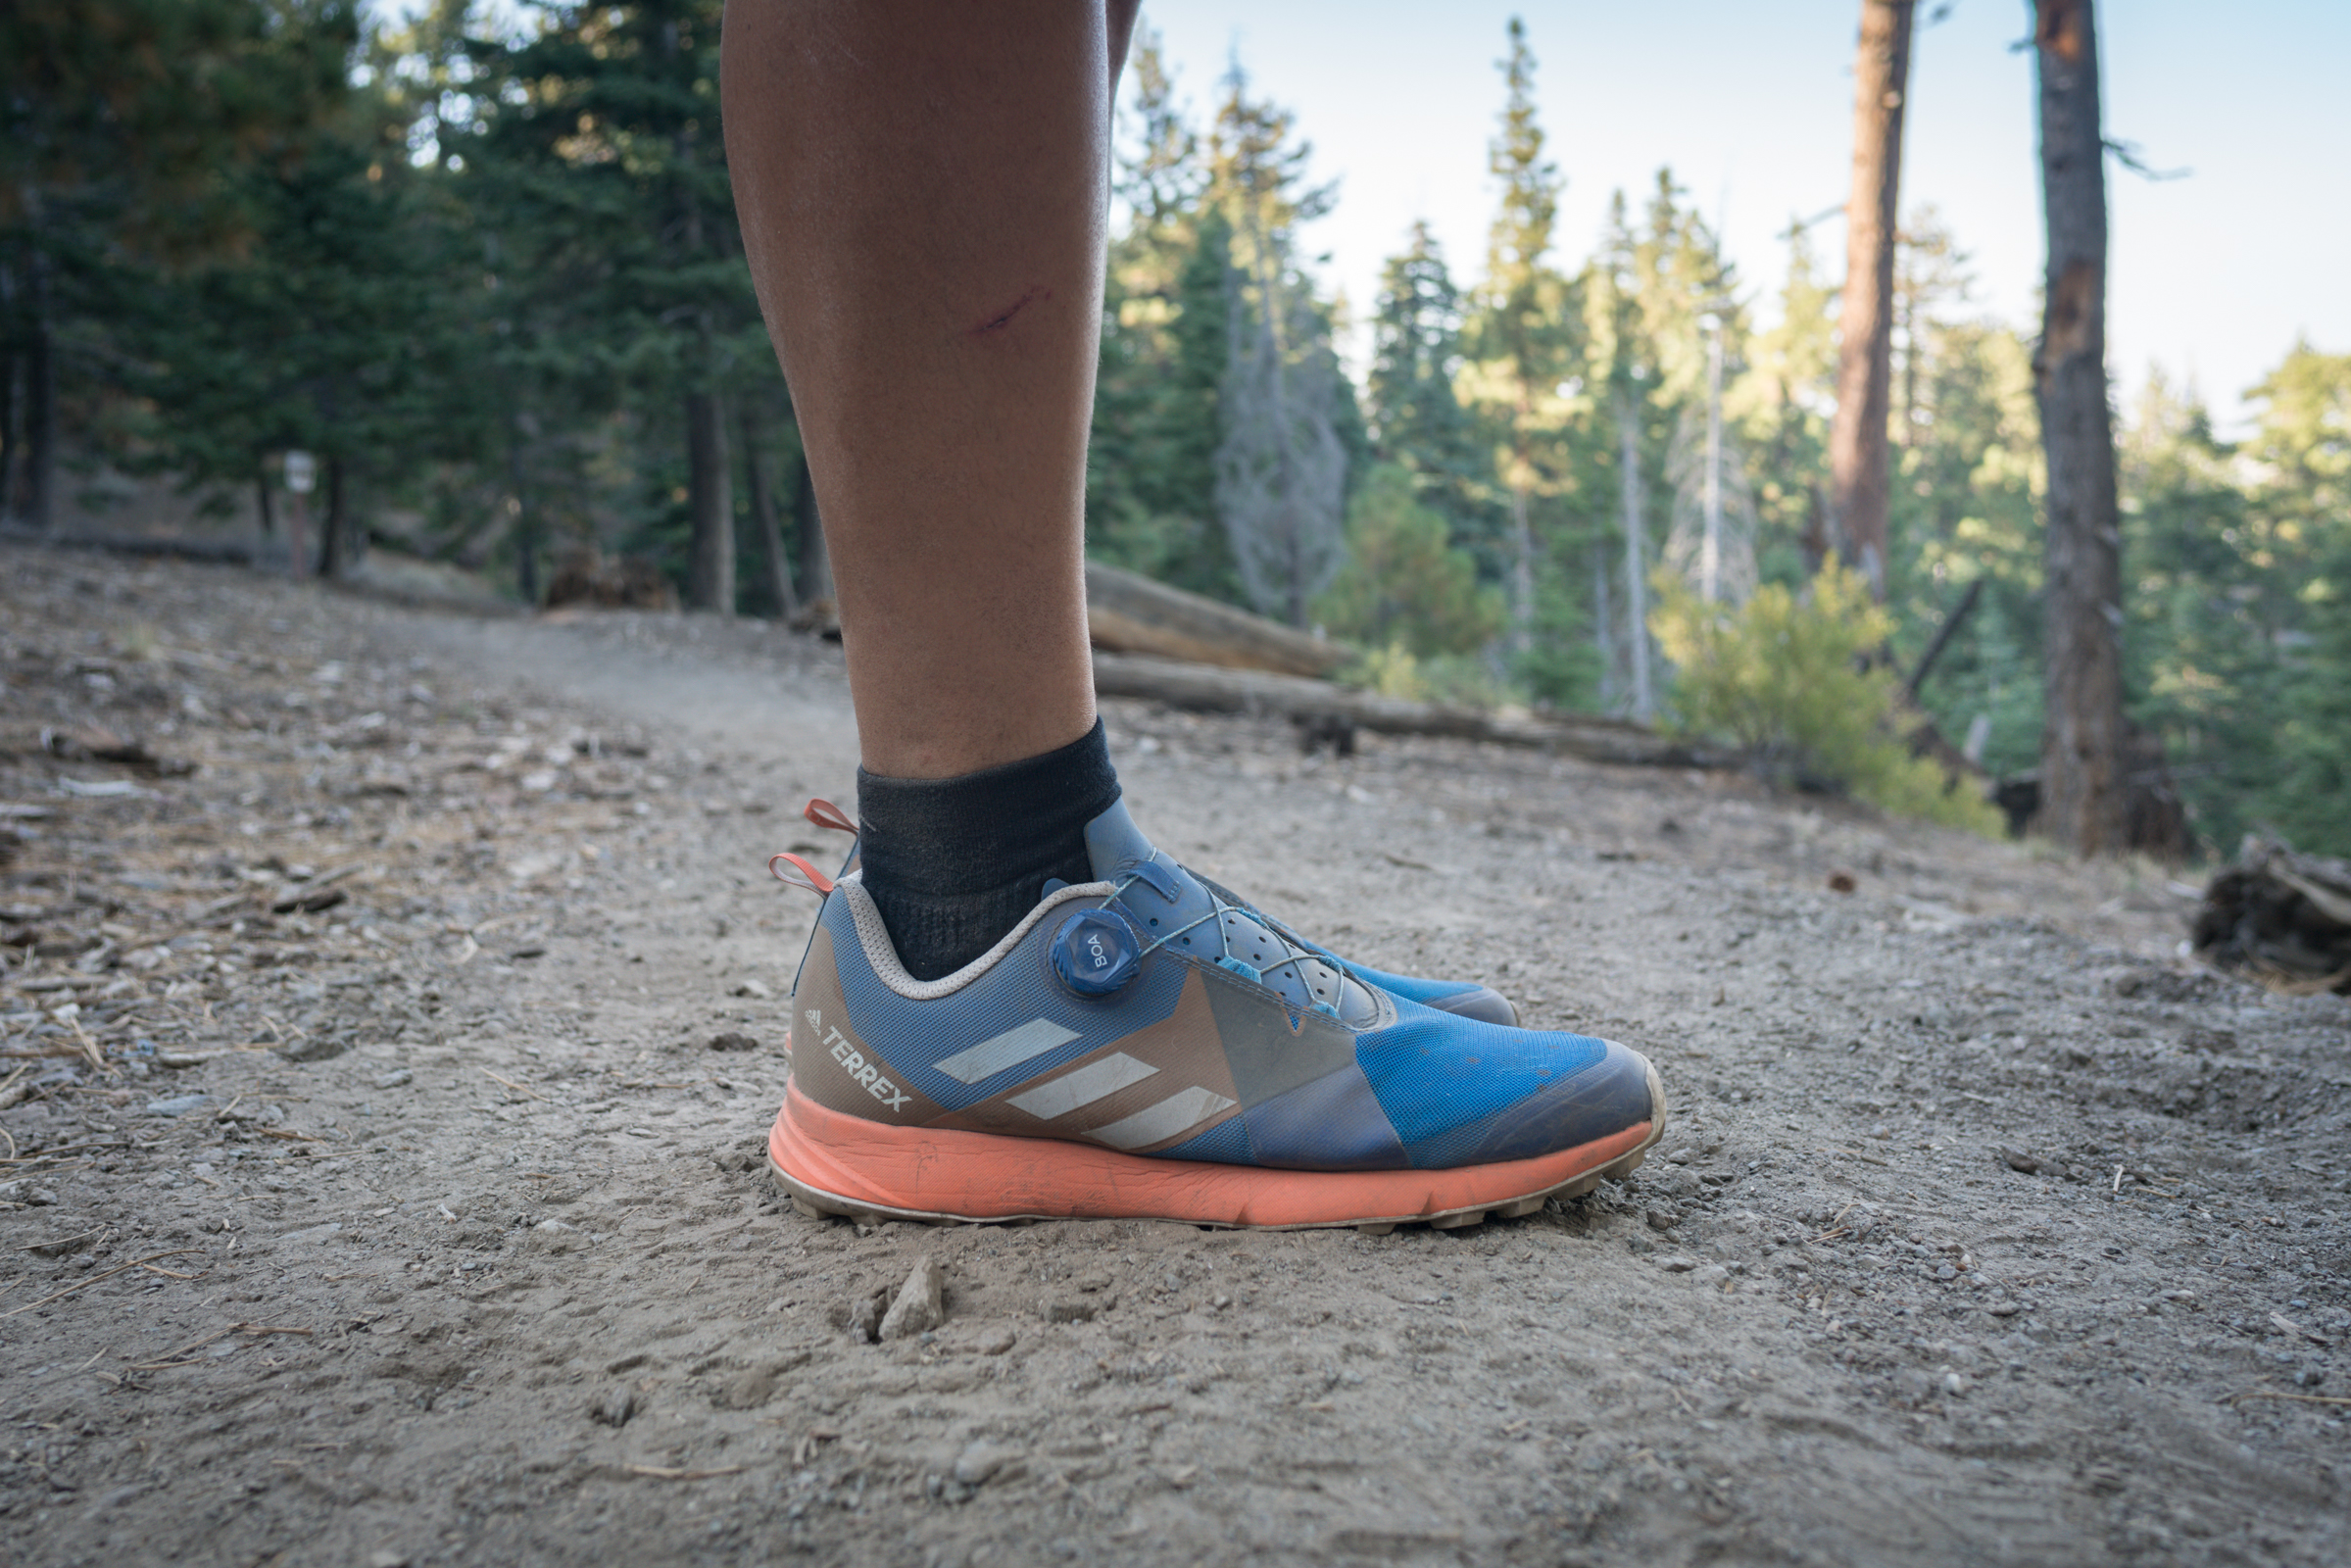 Gear Review: Adidas Terrex Two Boa Trail Shoe Trail to Peak